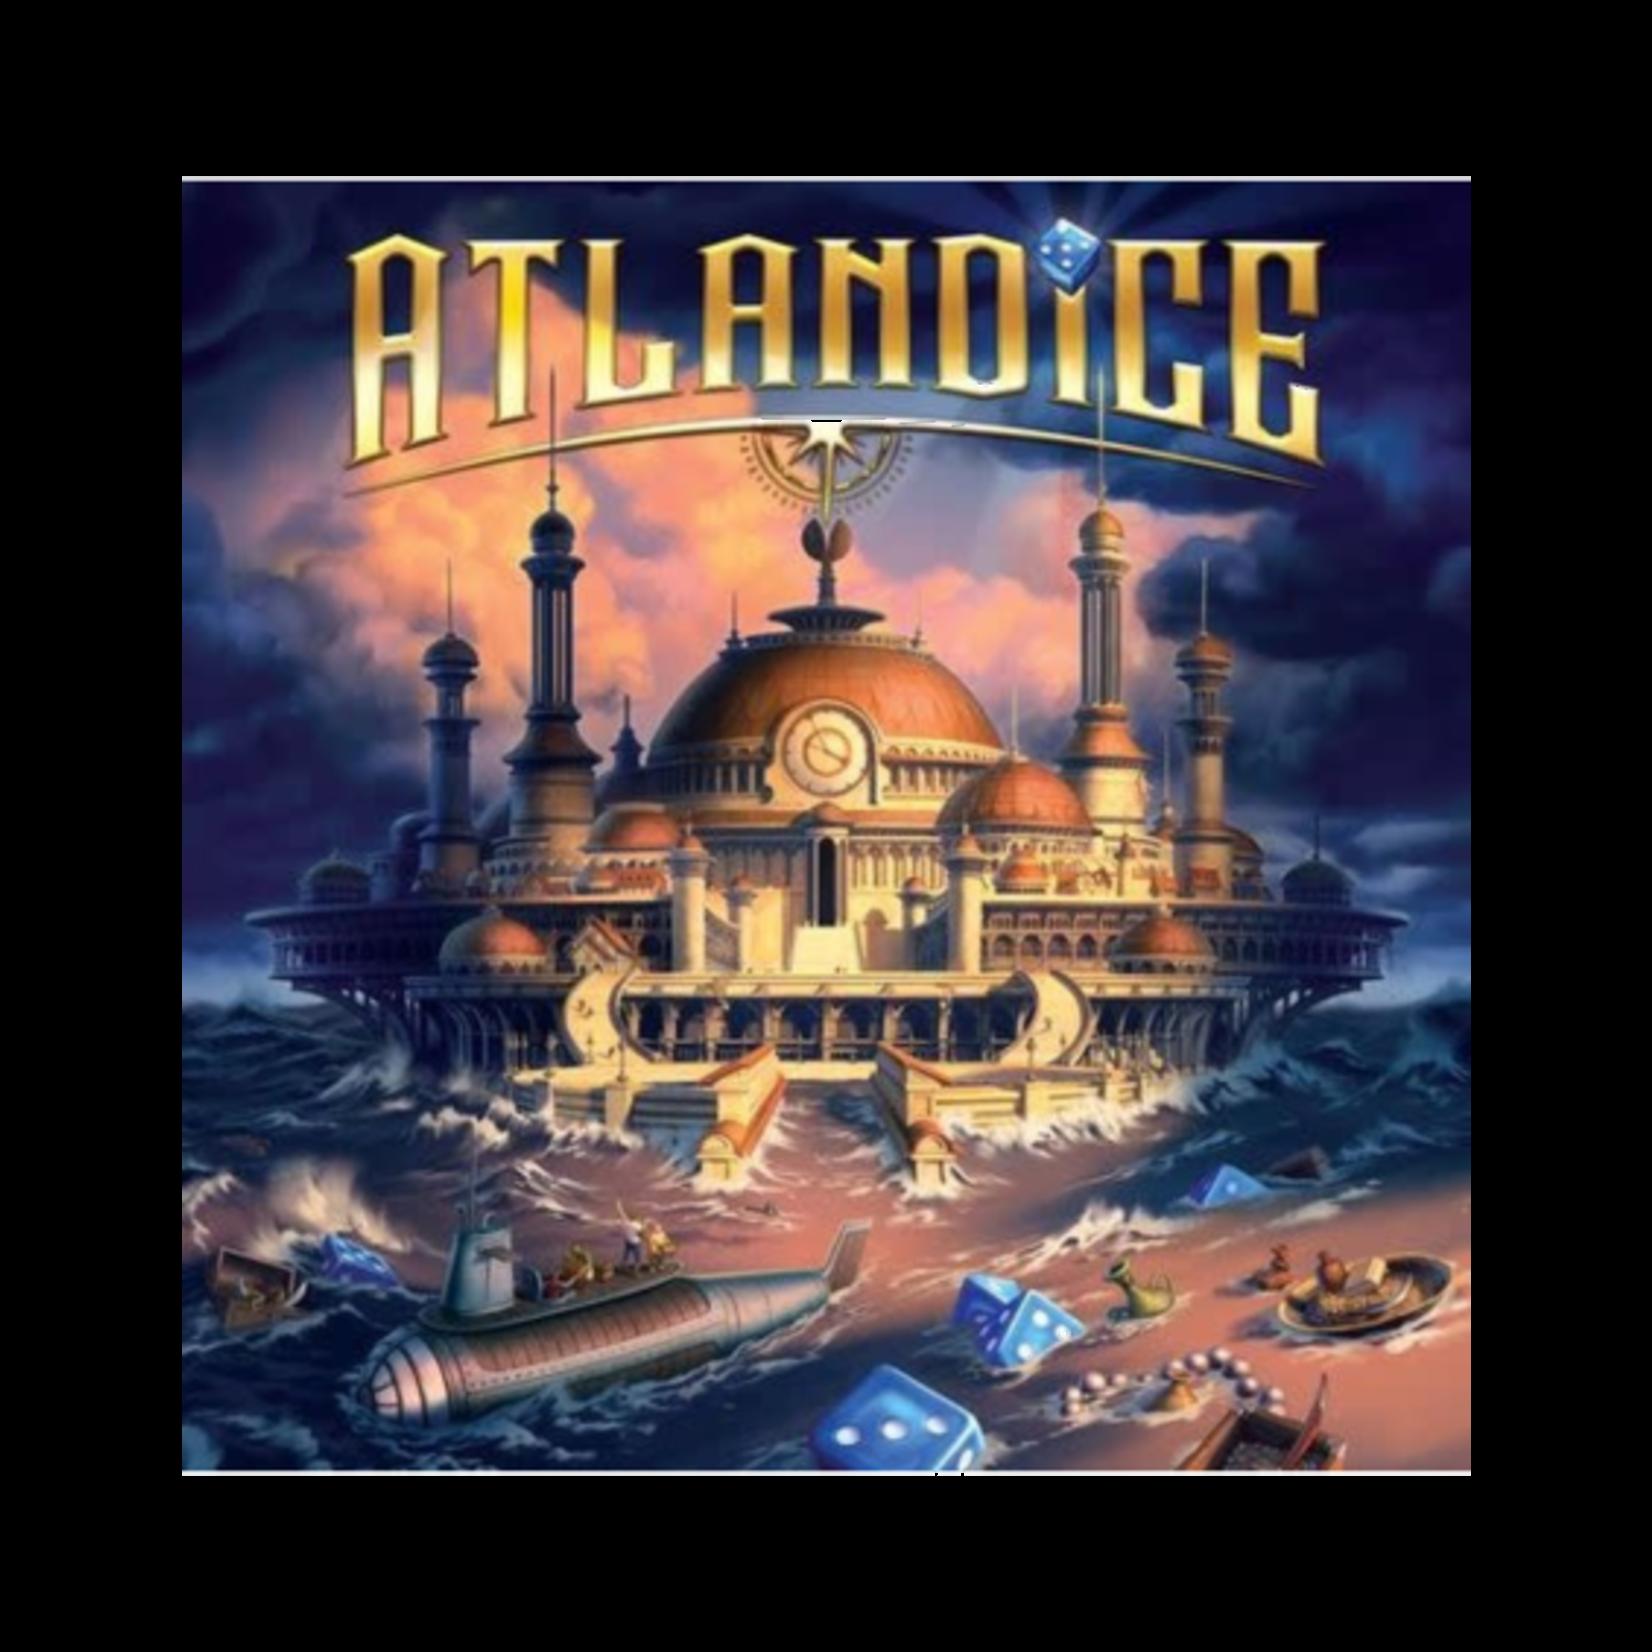 Asmodee Atlandice